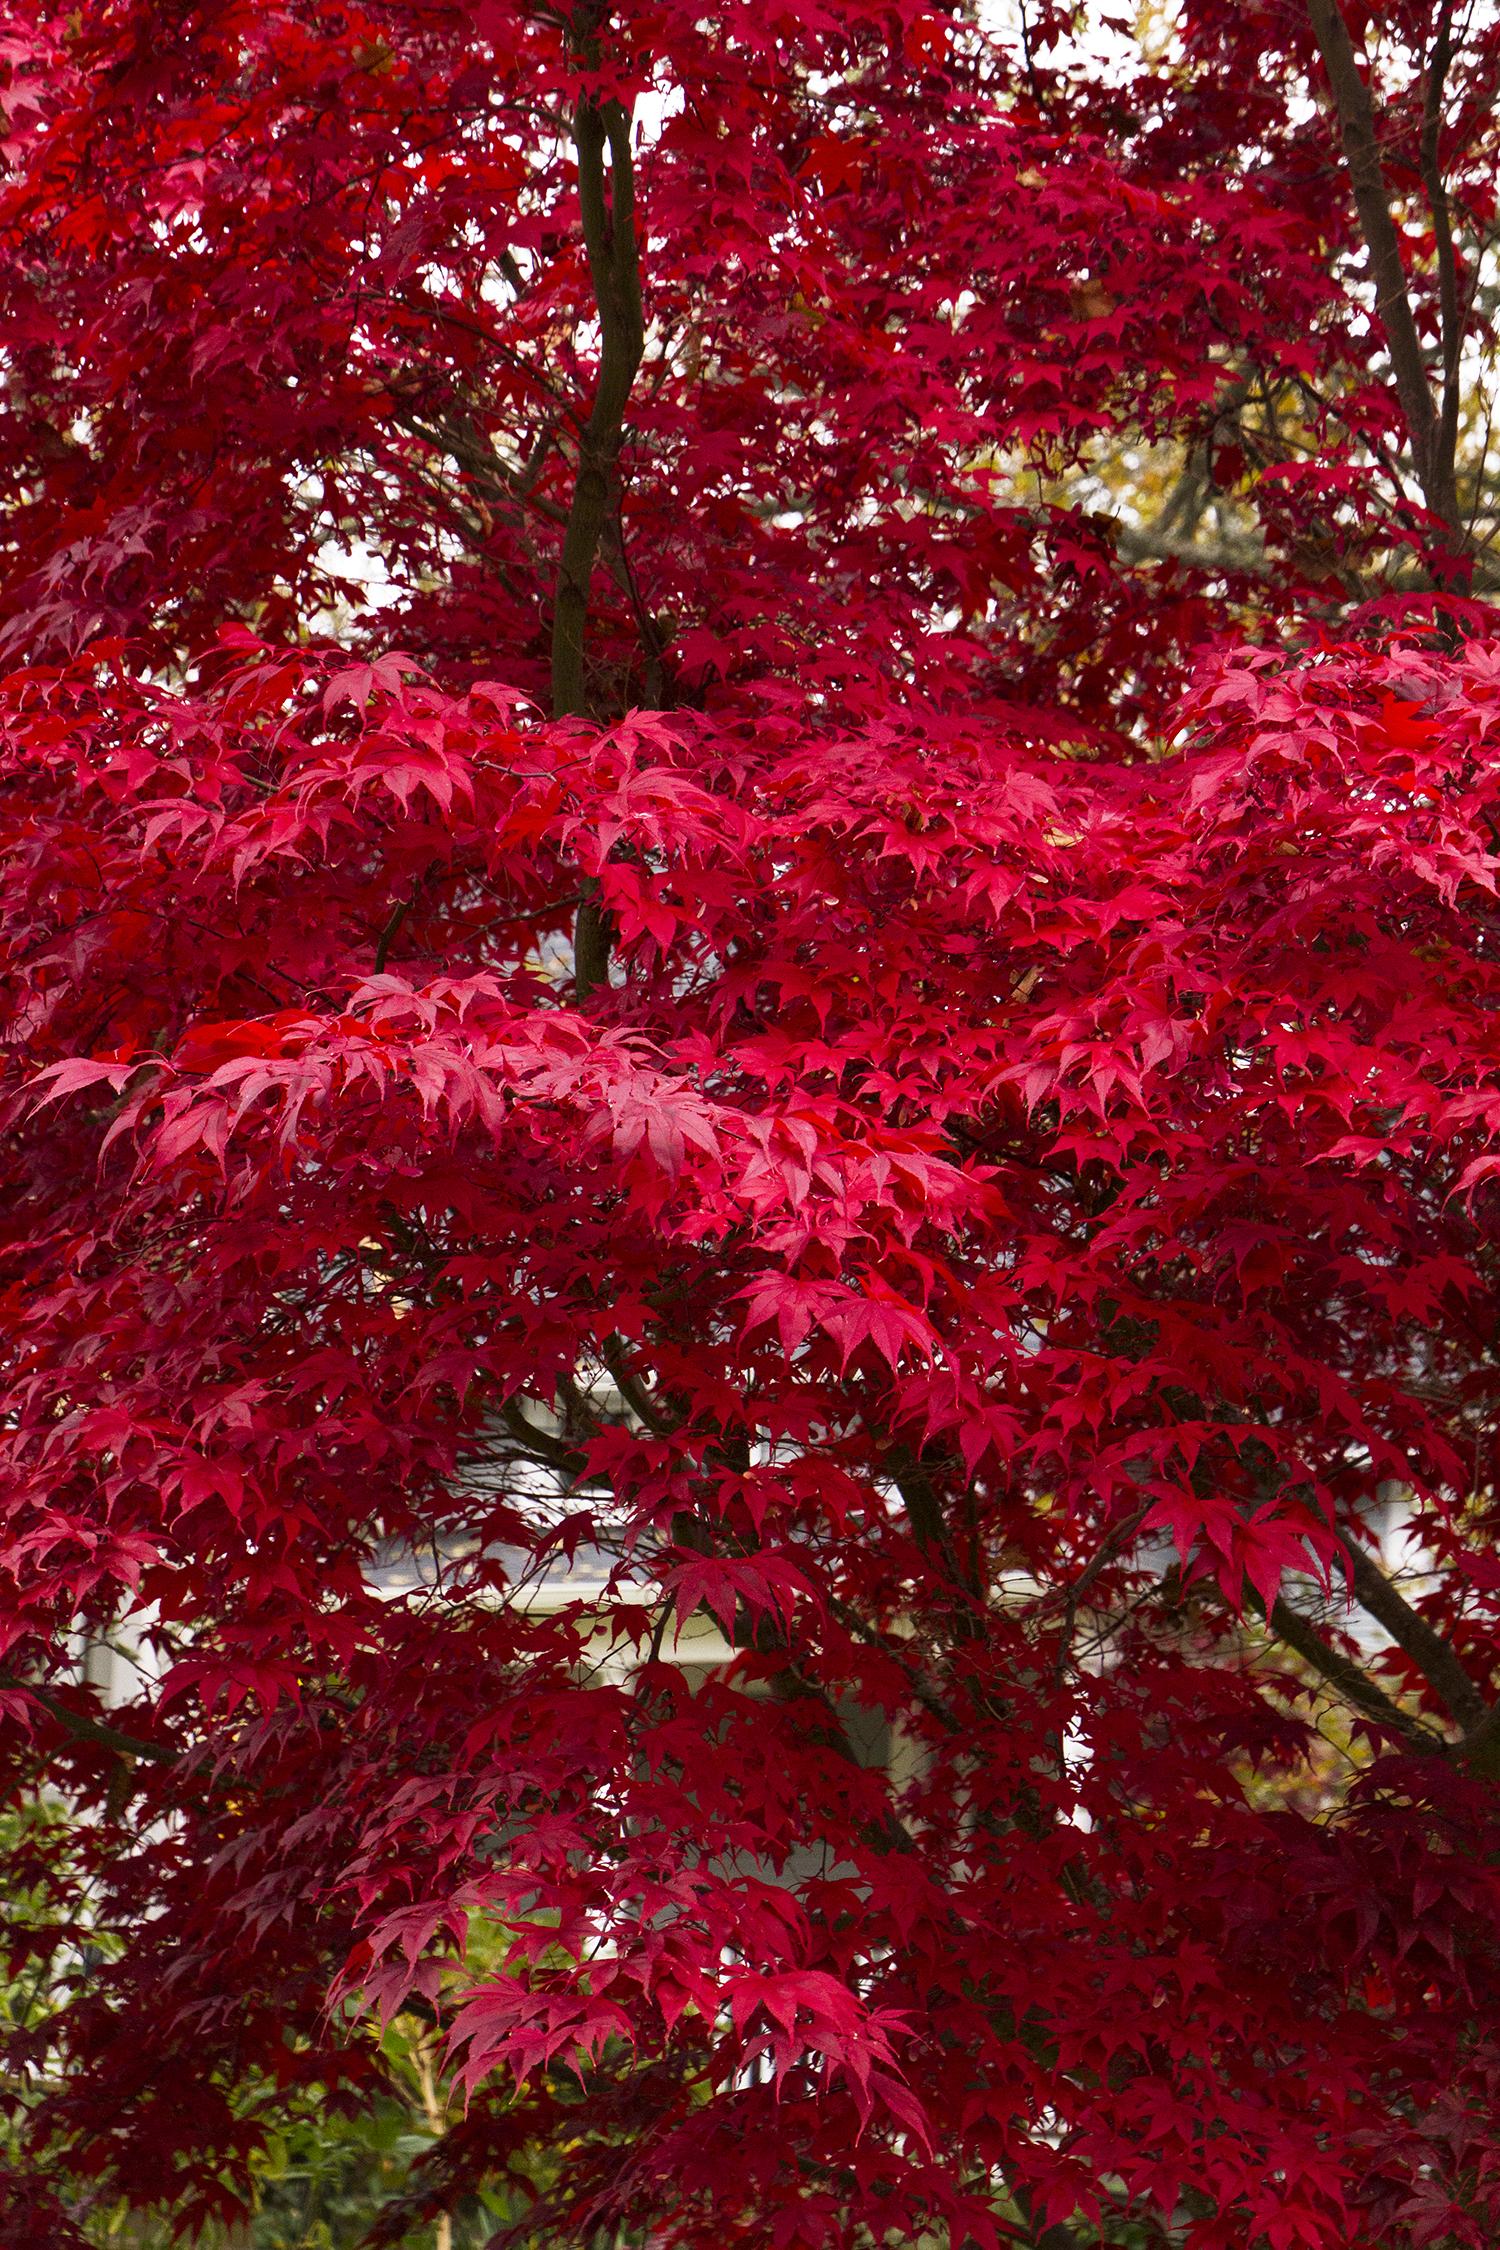 Bloodgood Japanese Maple Monrovia Bloodgood Japanese Maple